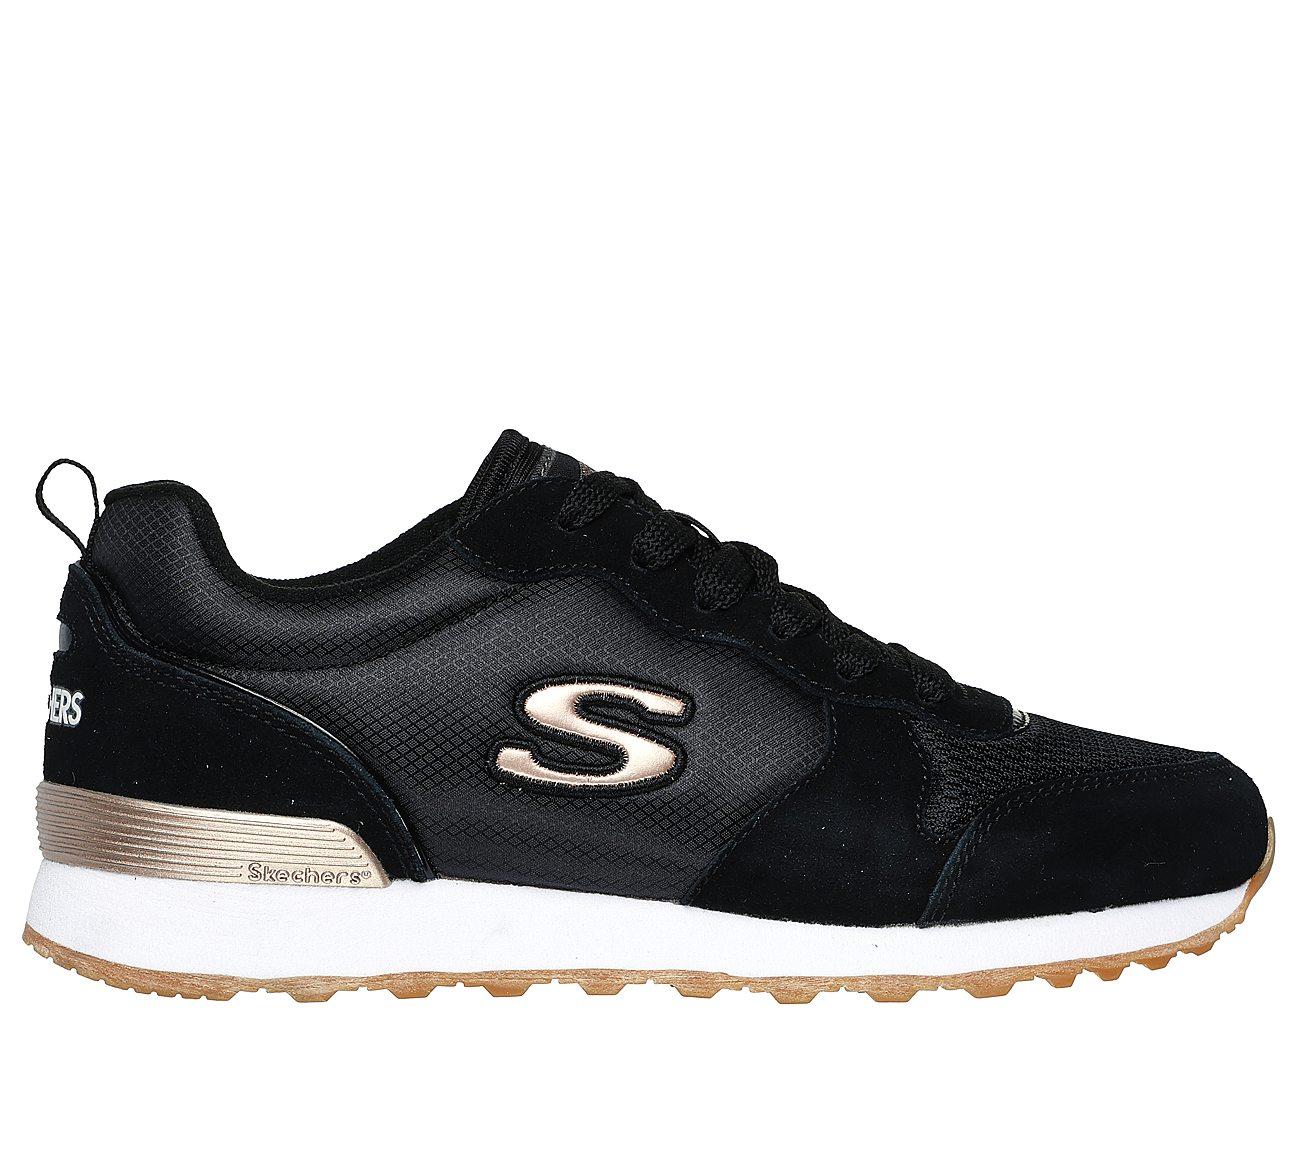 Derretido Mayor miseria  Buy SKECHERS OG 85 - Goldn Gurl SKECHER Street Shoes